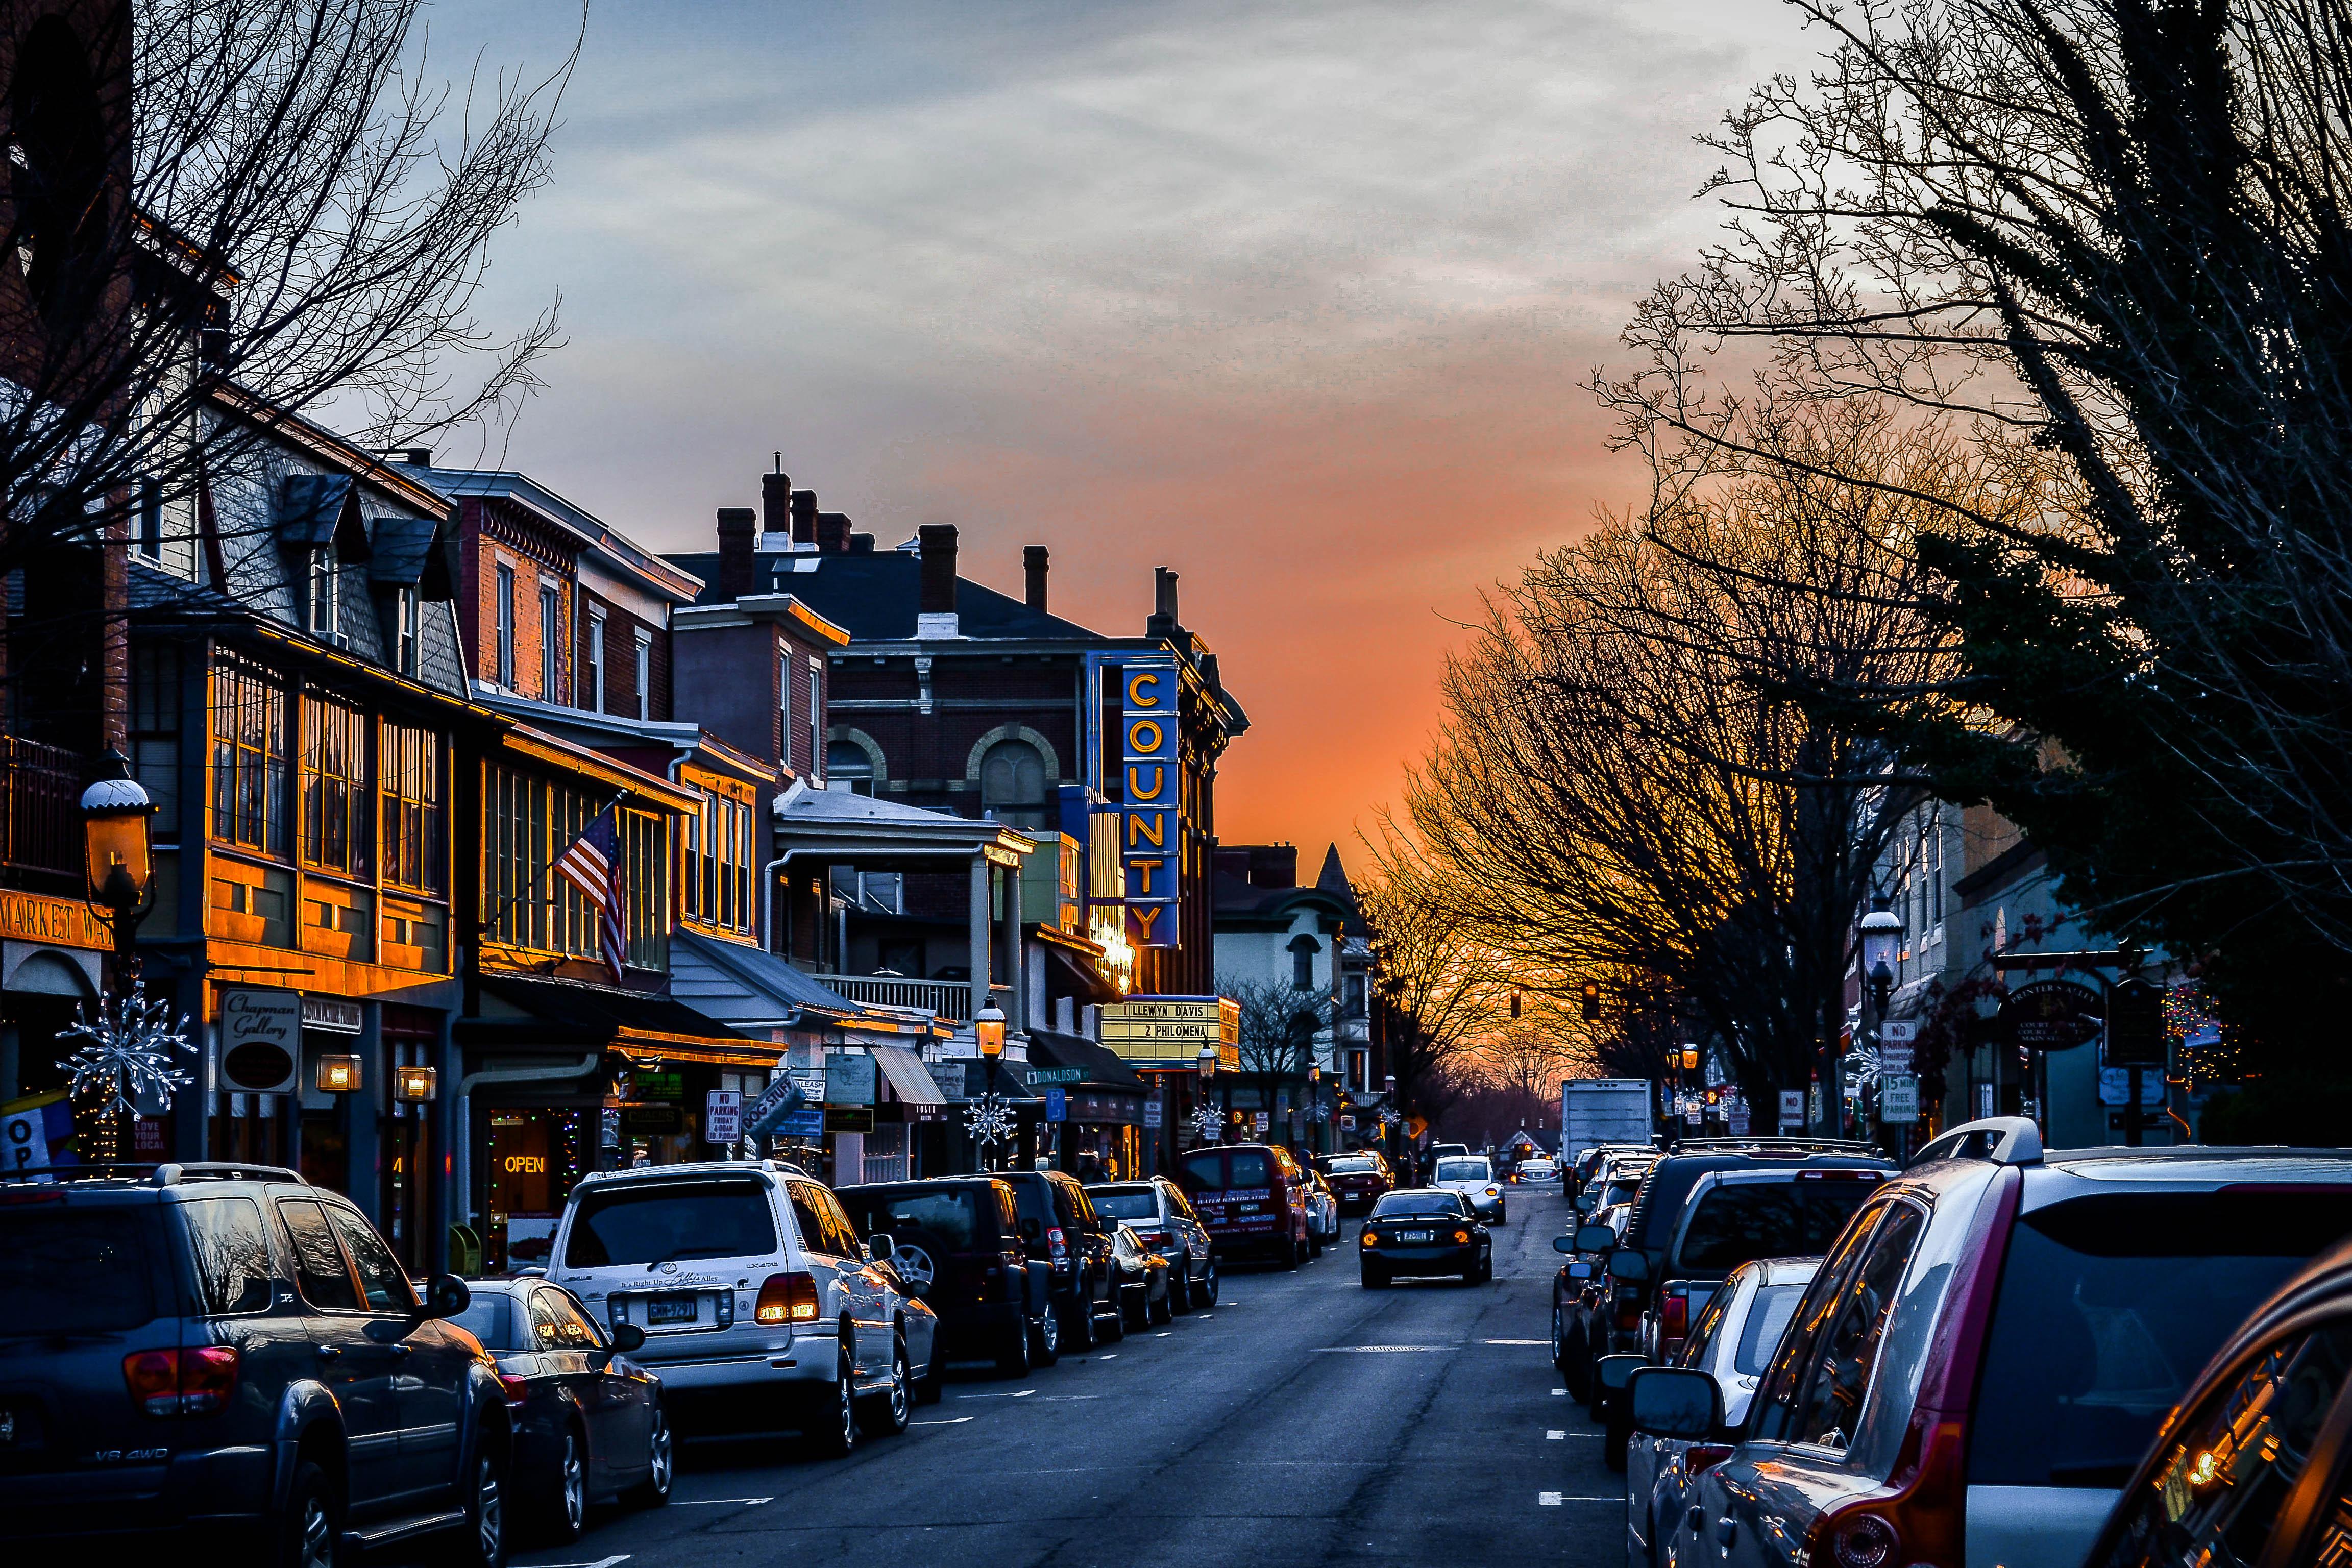 Small Backyard Wedding Doylestown Pa Wedding Photography: Doylestown Named One Of America's Quirkiest Towns